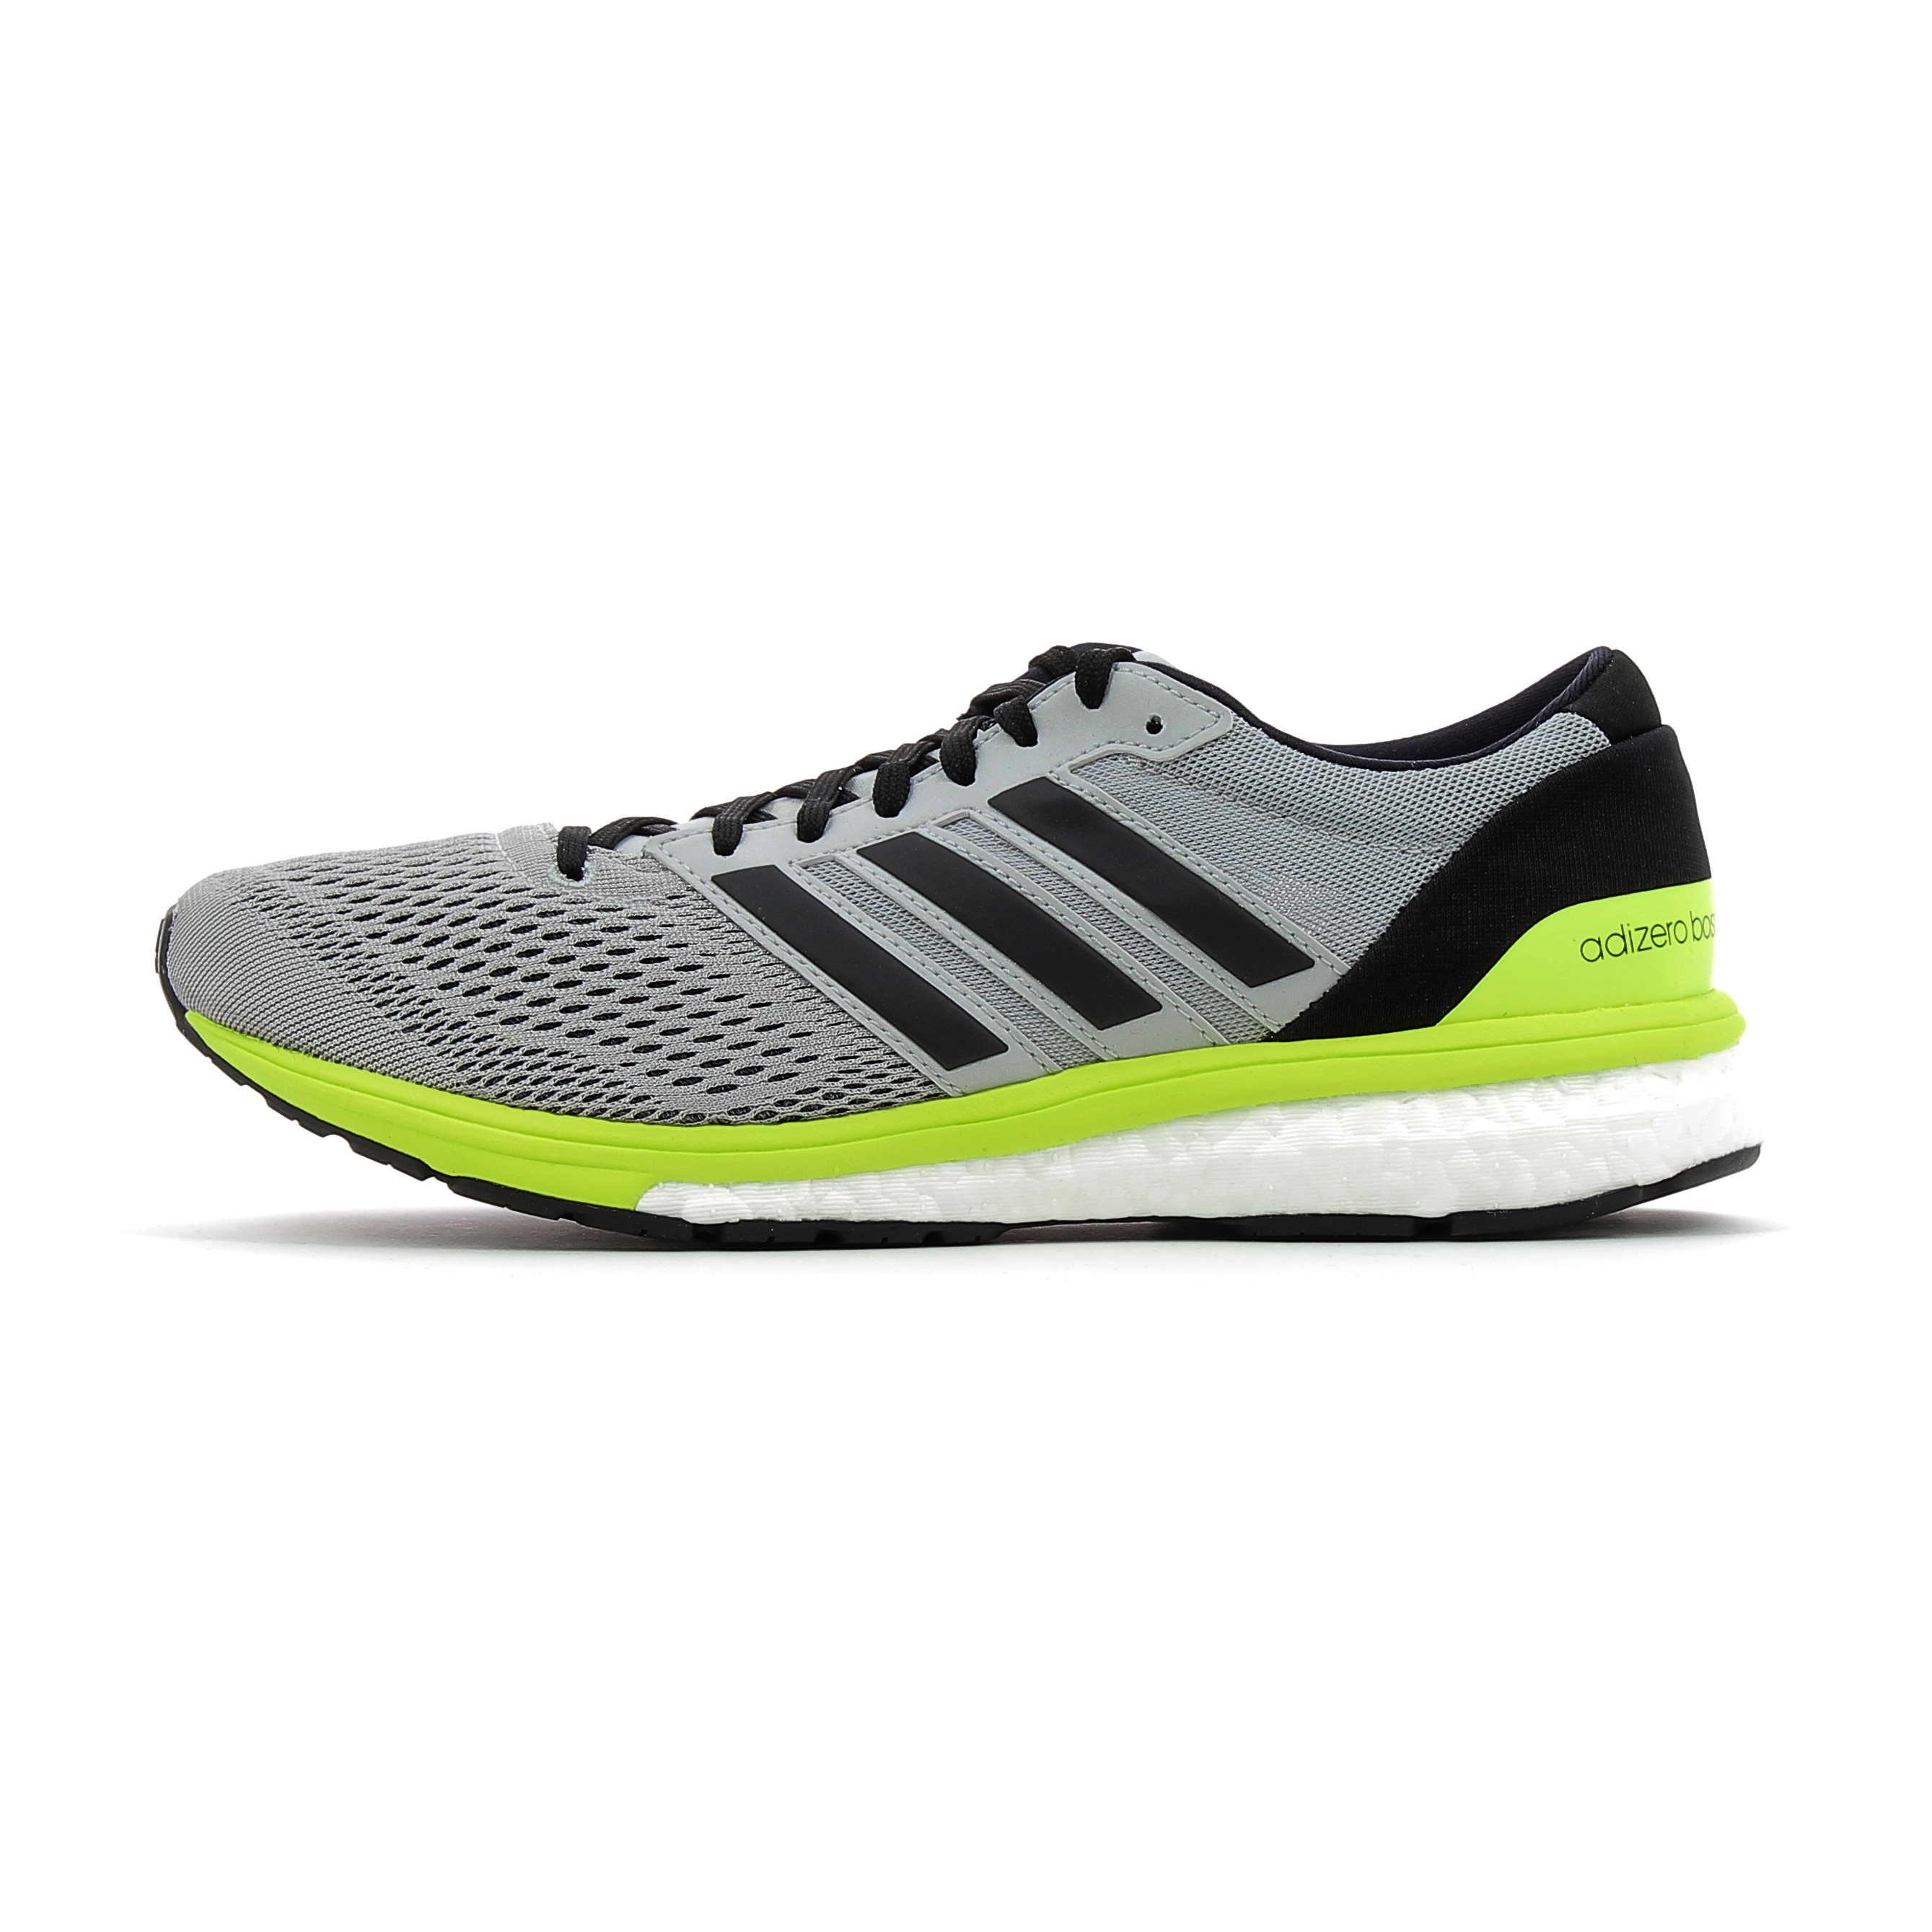 9a2f7584bfd Chaussures de Running Femme adidas running Adizero Boston 6 W Gris ...